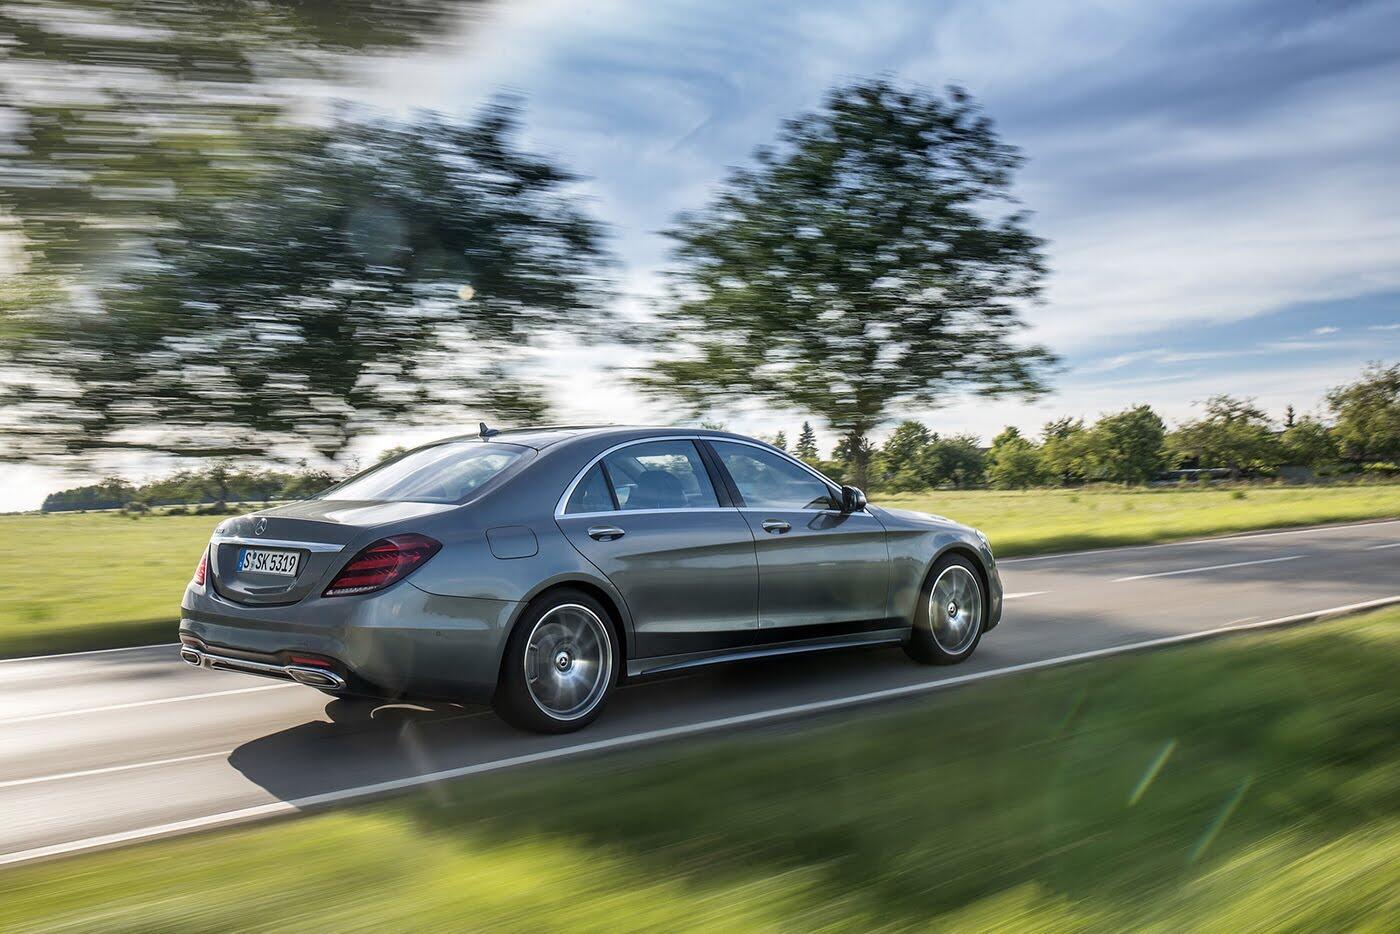 Ảnh chi tiết Mercedes-Benz S-Class 2018 - Hình 27